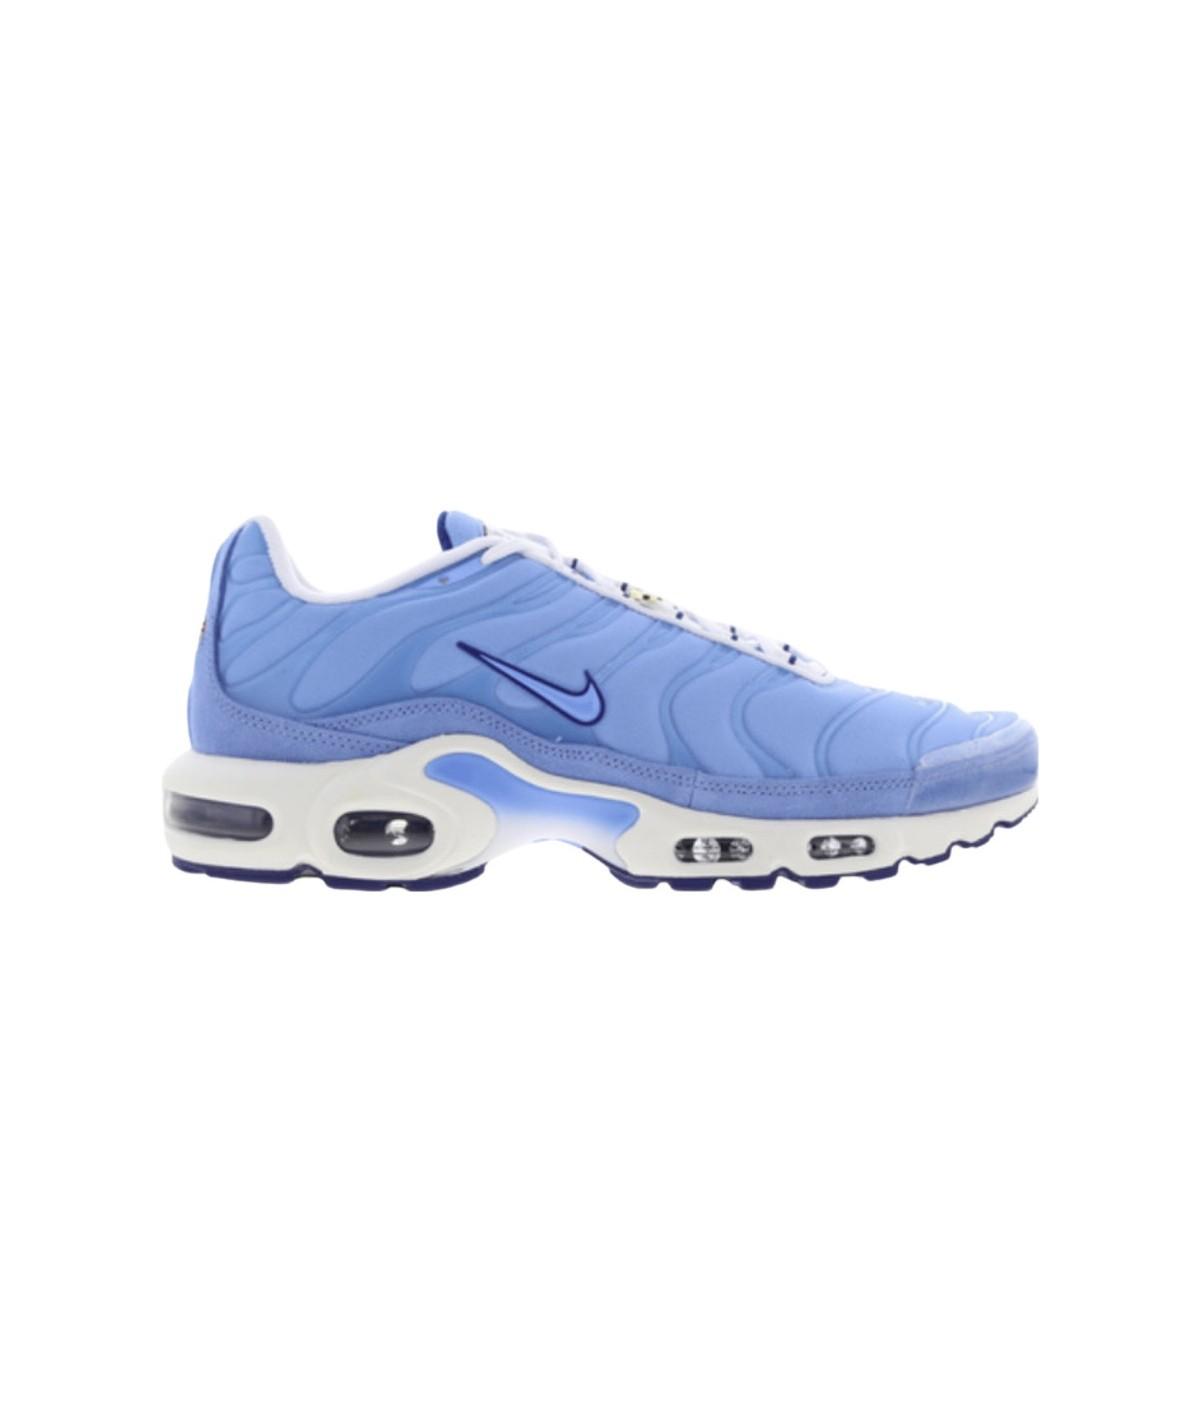 Nike Air Max Plus 'Requin Bleu'